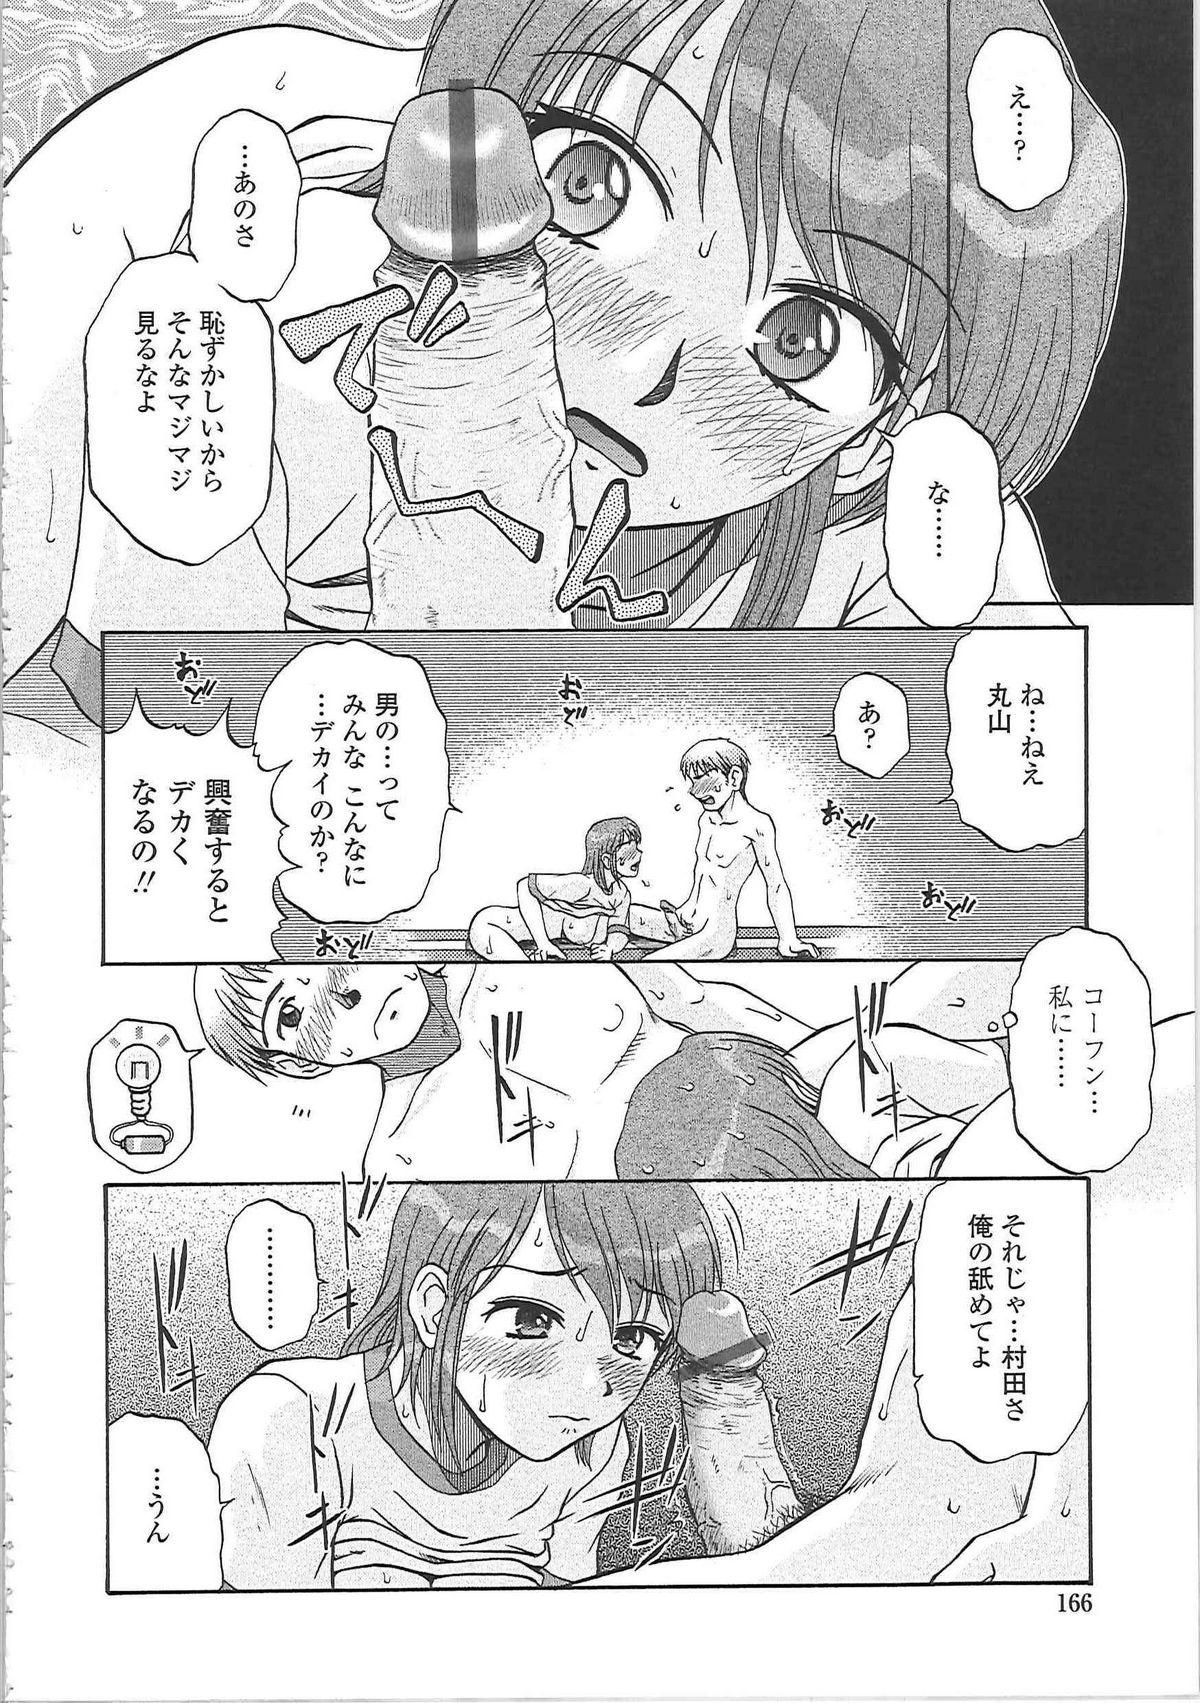 Nikuzuma Tsuushin - Erotic Wife Communication 170